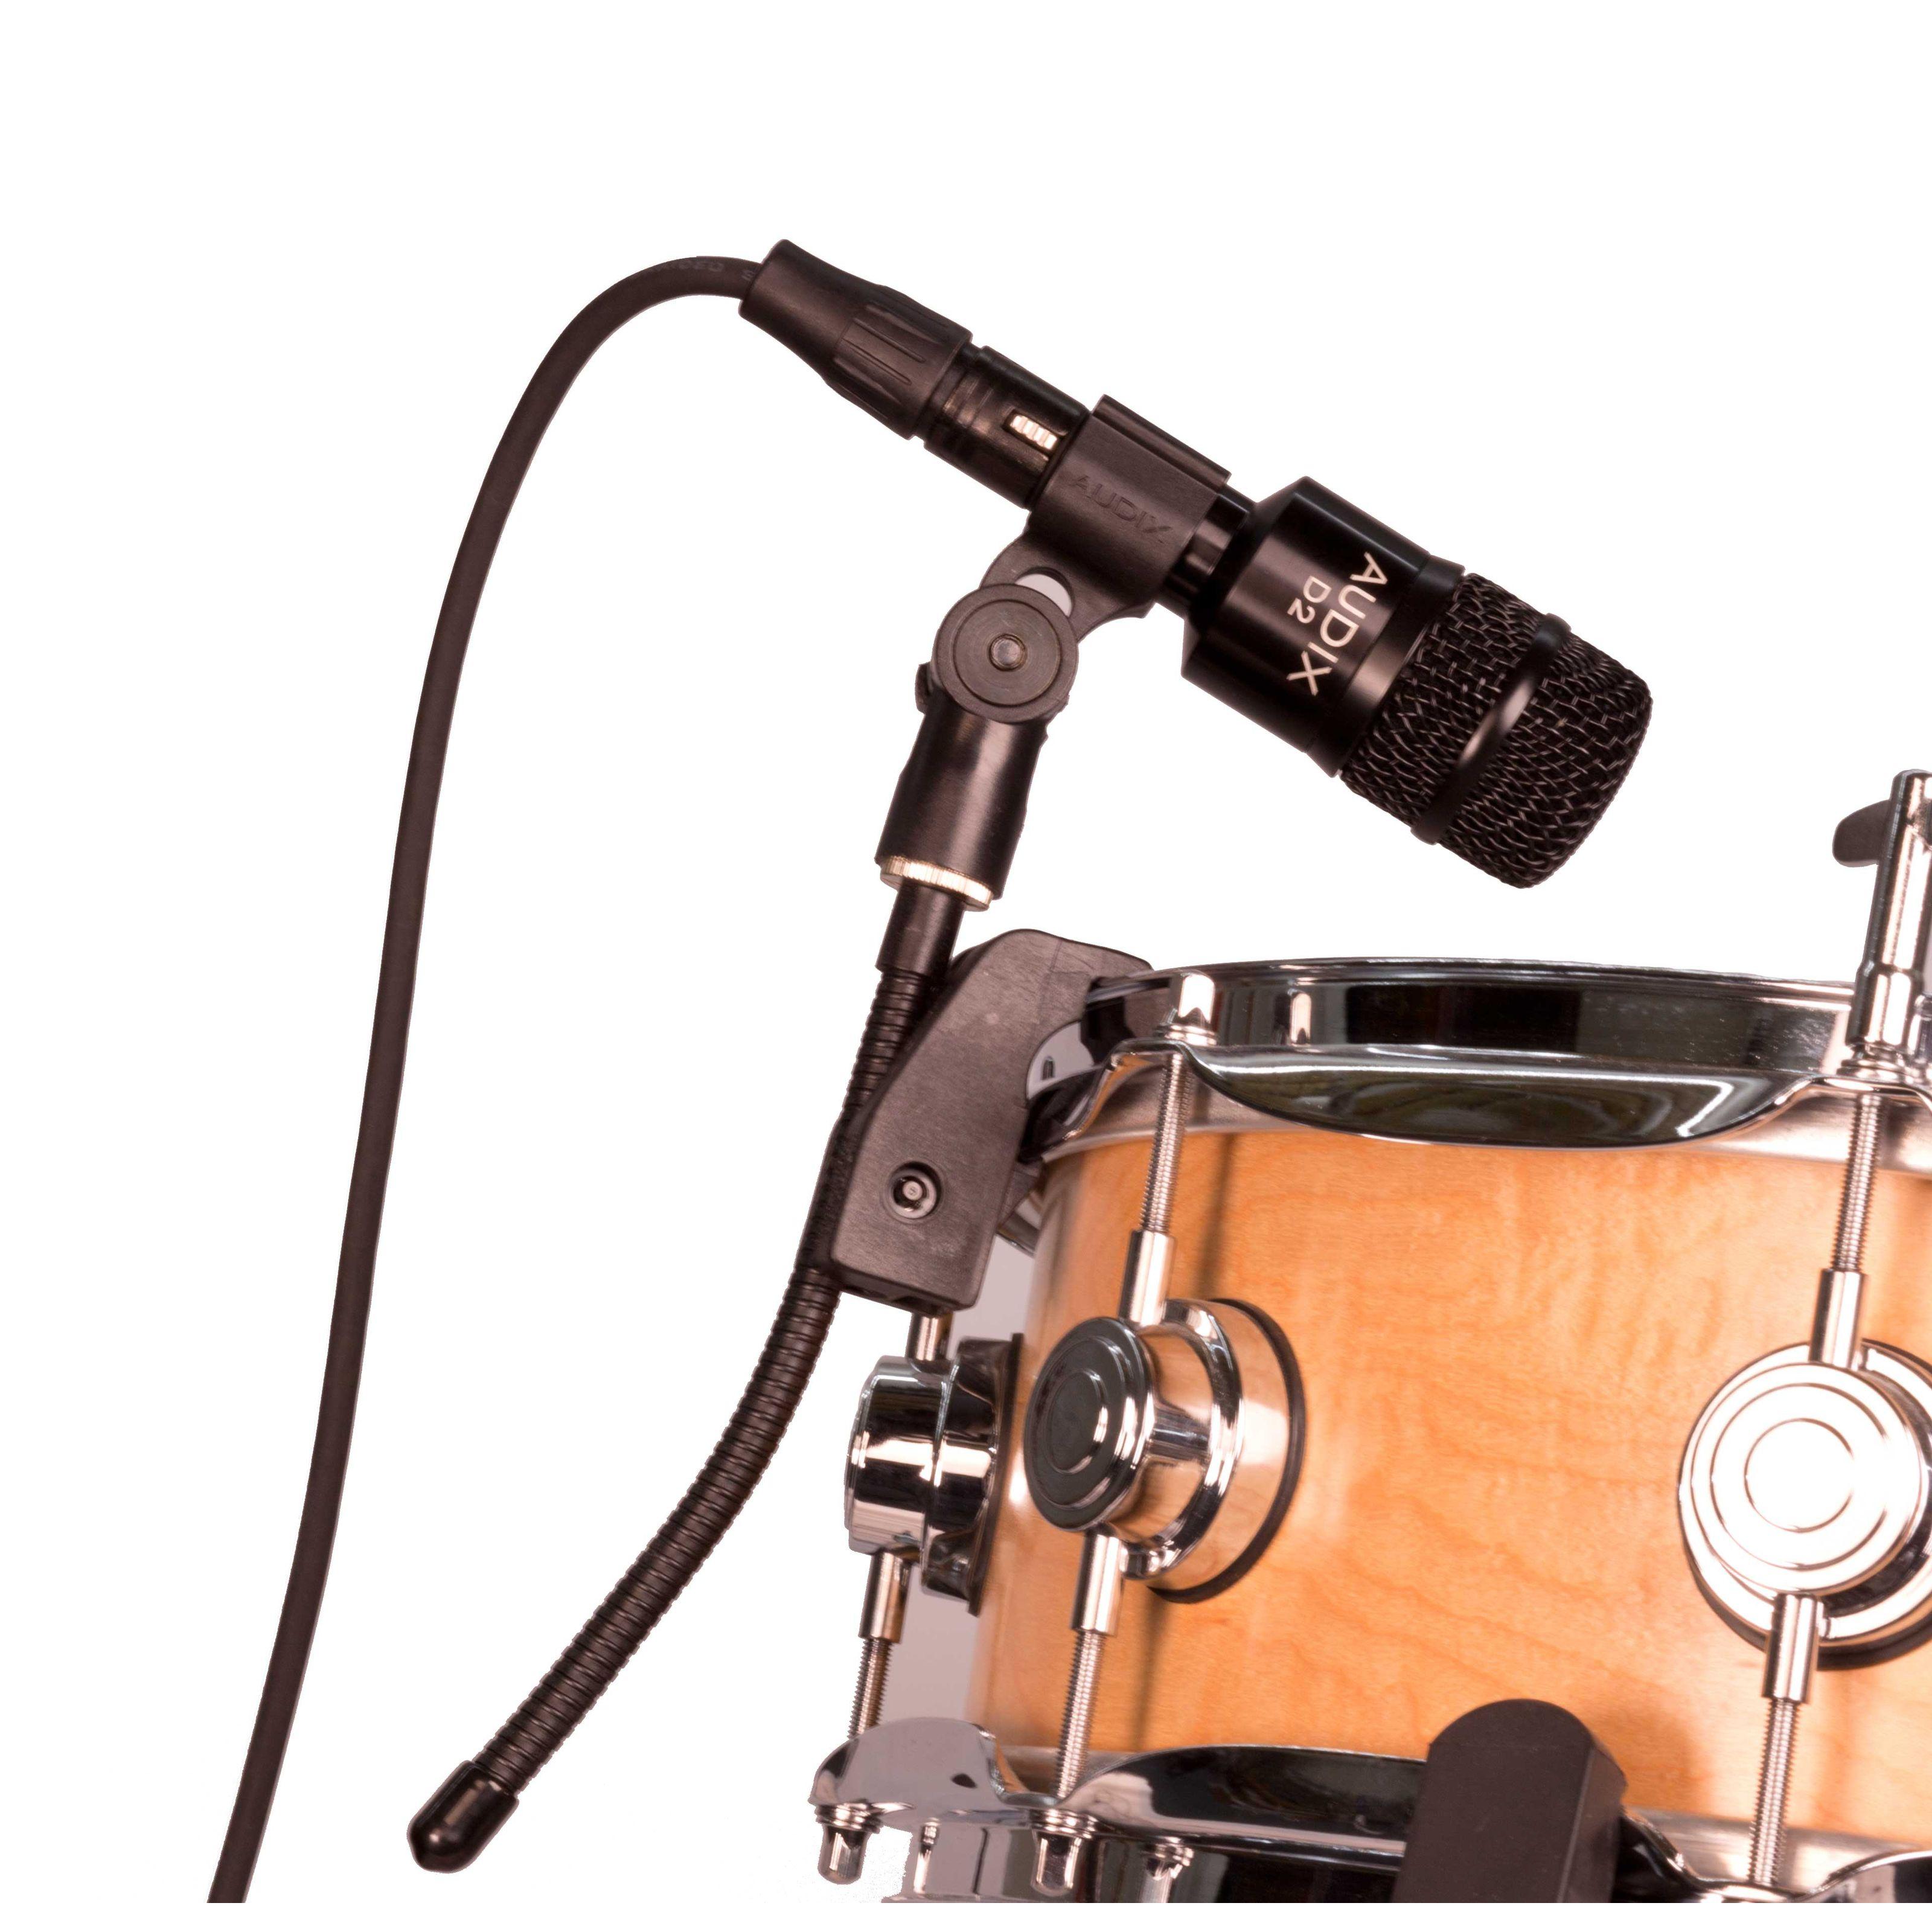 Audix - D-VICE Mikrofonbefestigung 36.09.03